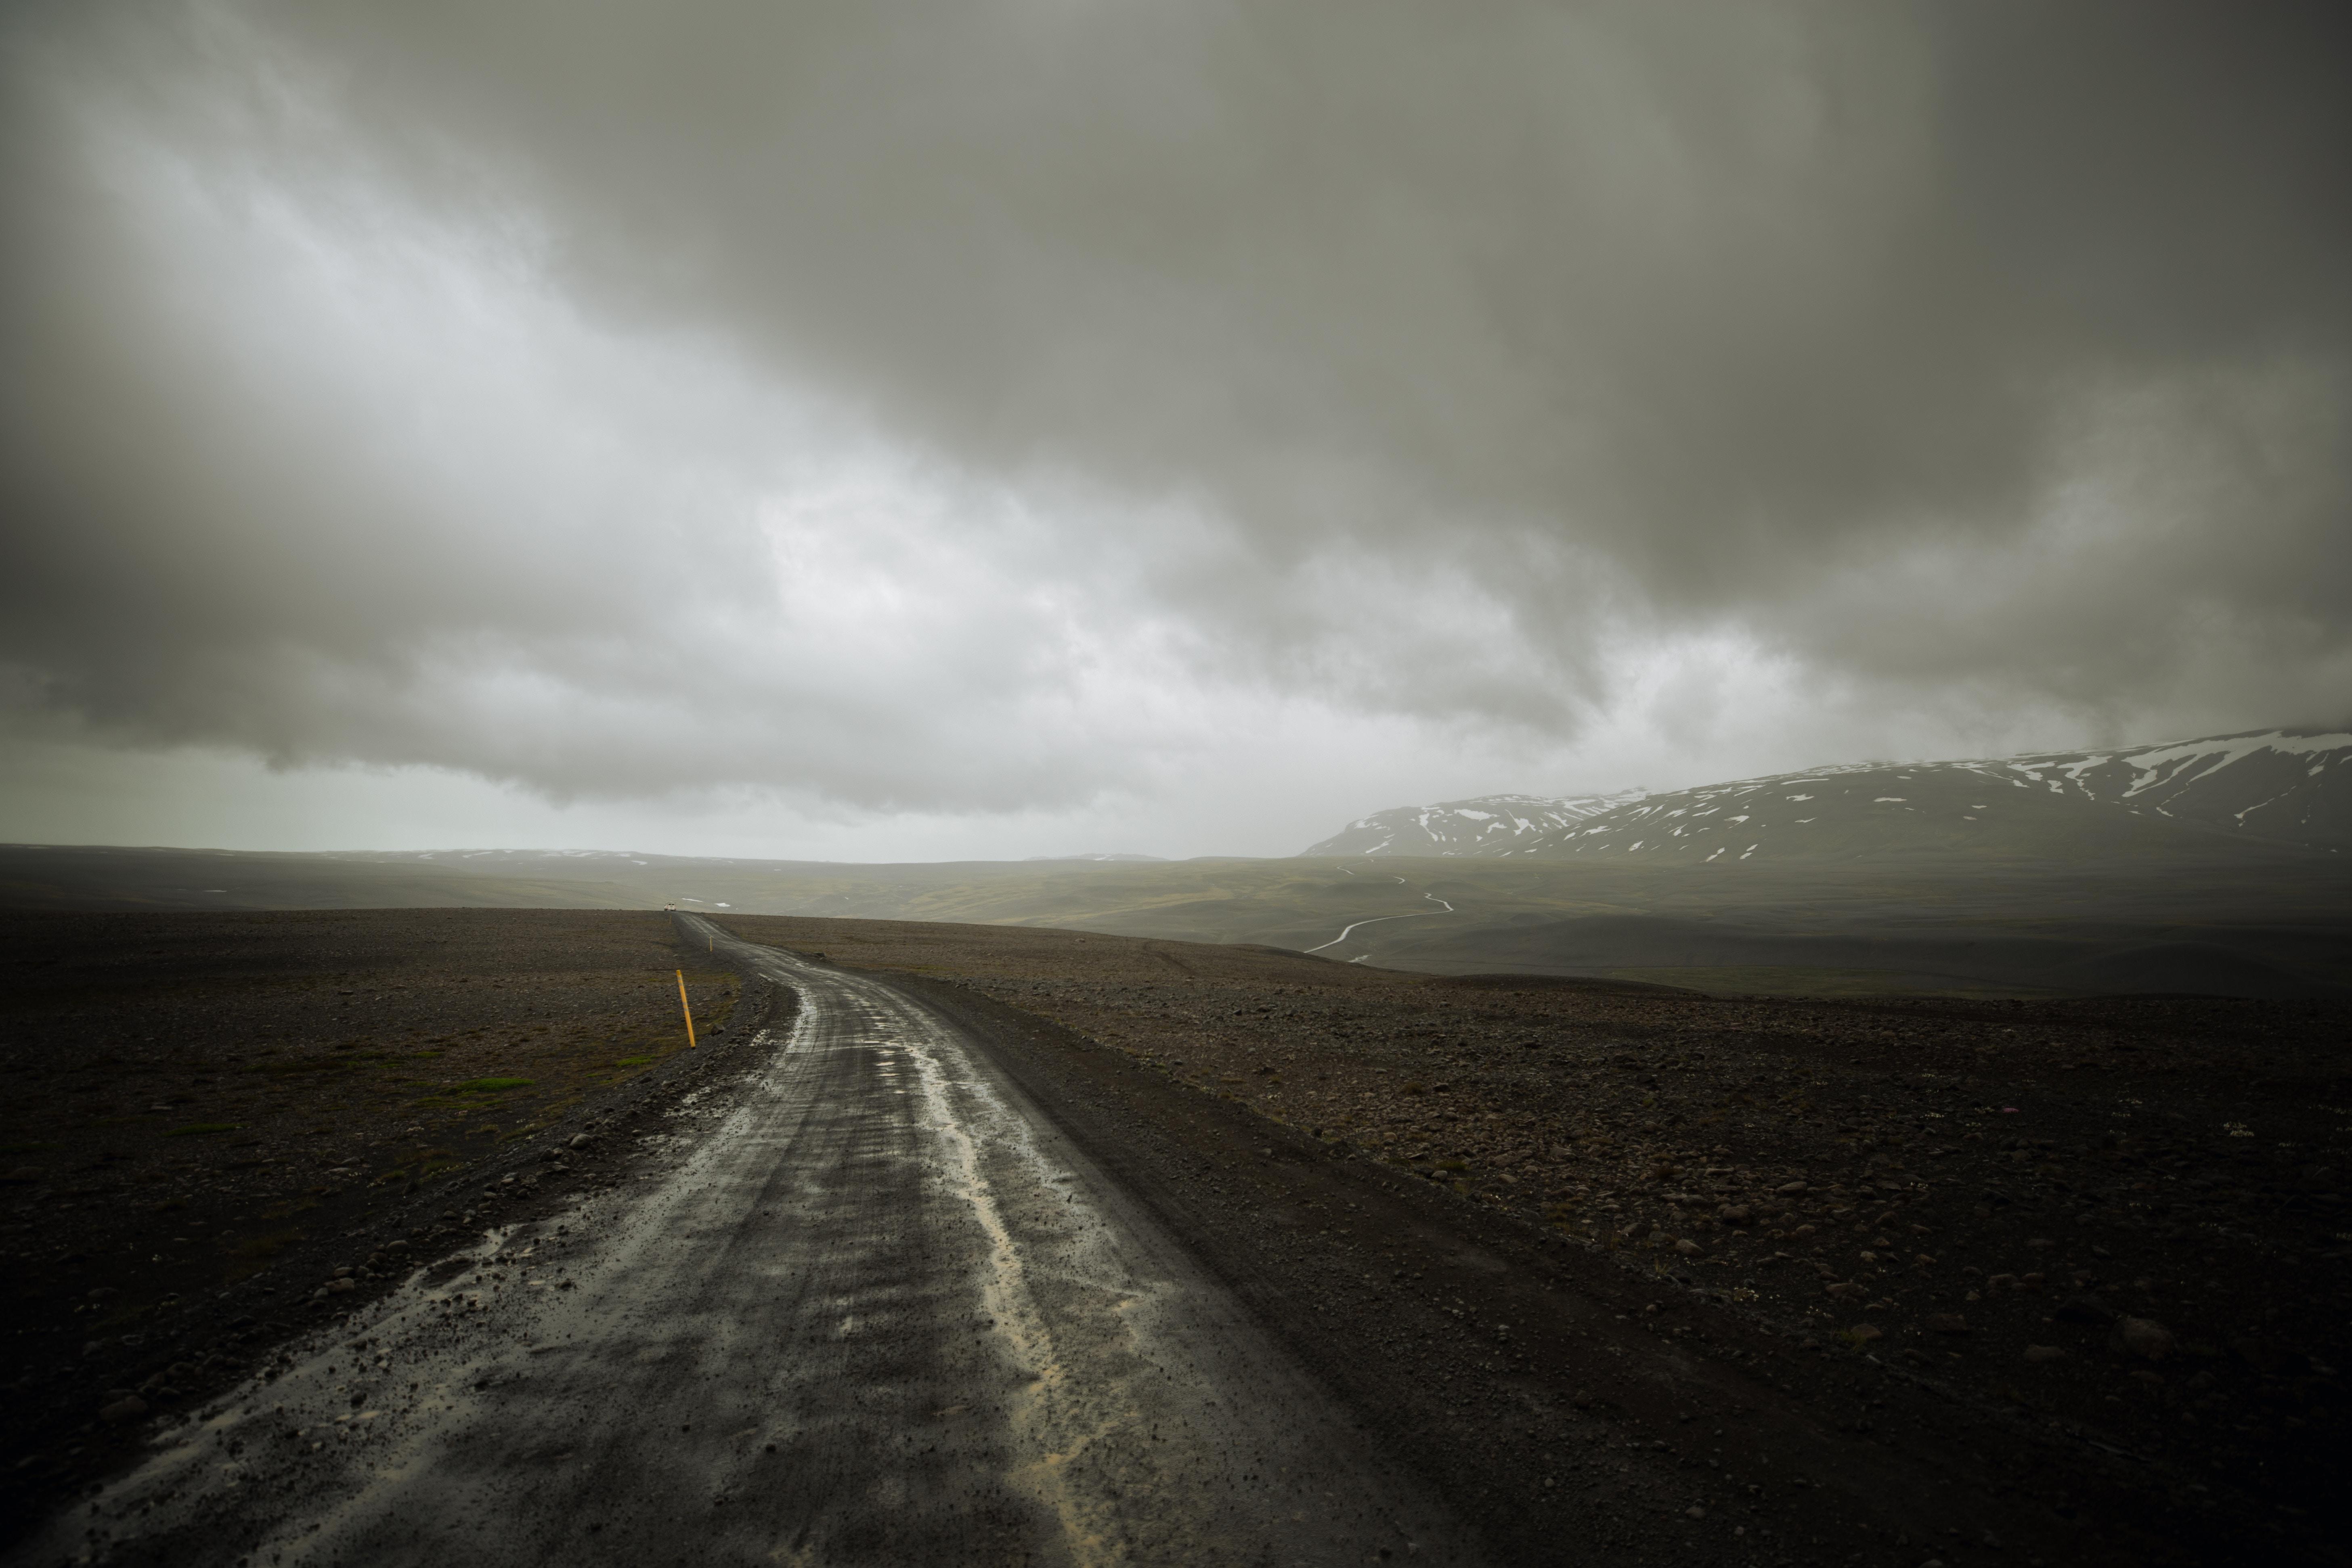 Cloud Iceland Landscape Mountain Road 5826x3884